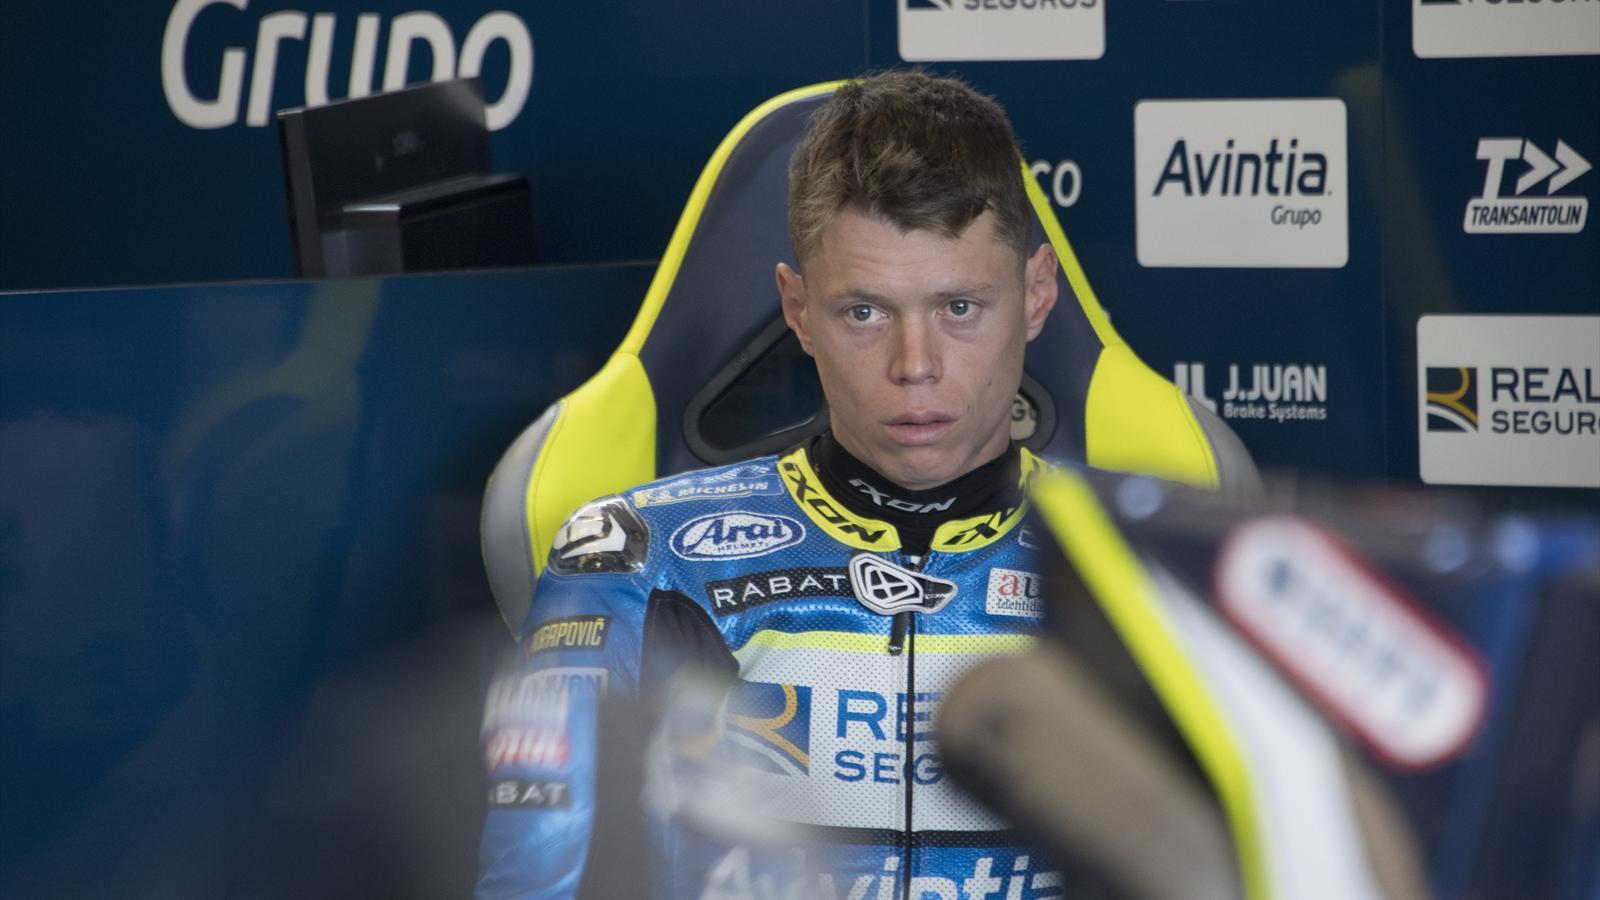 Rabat's leg 'twisted like an S' in Silverstone crash - Motorcycling - Eurosport Asia